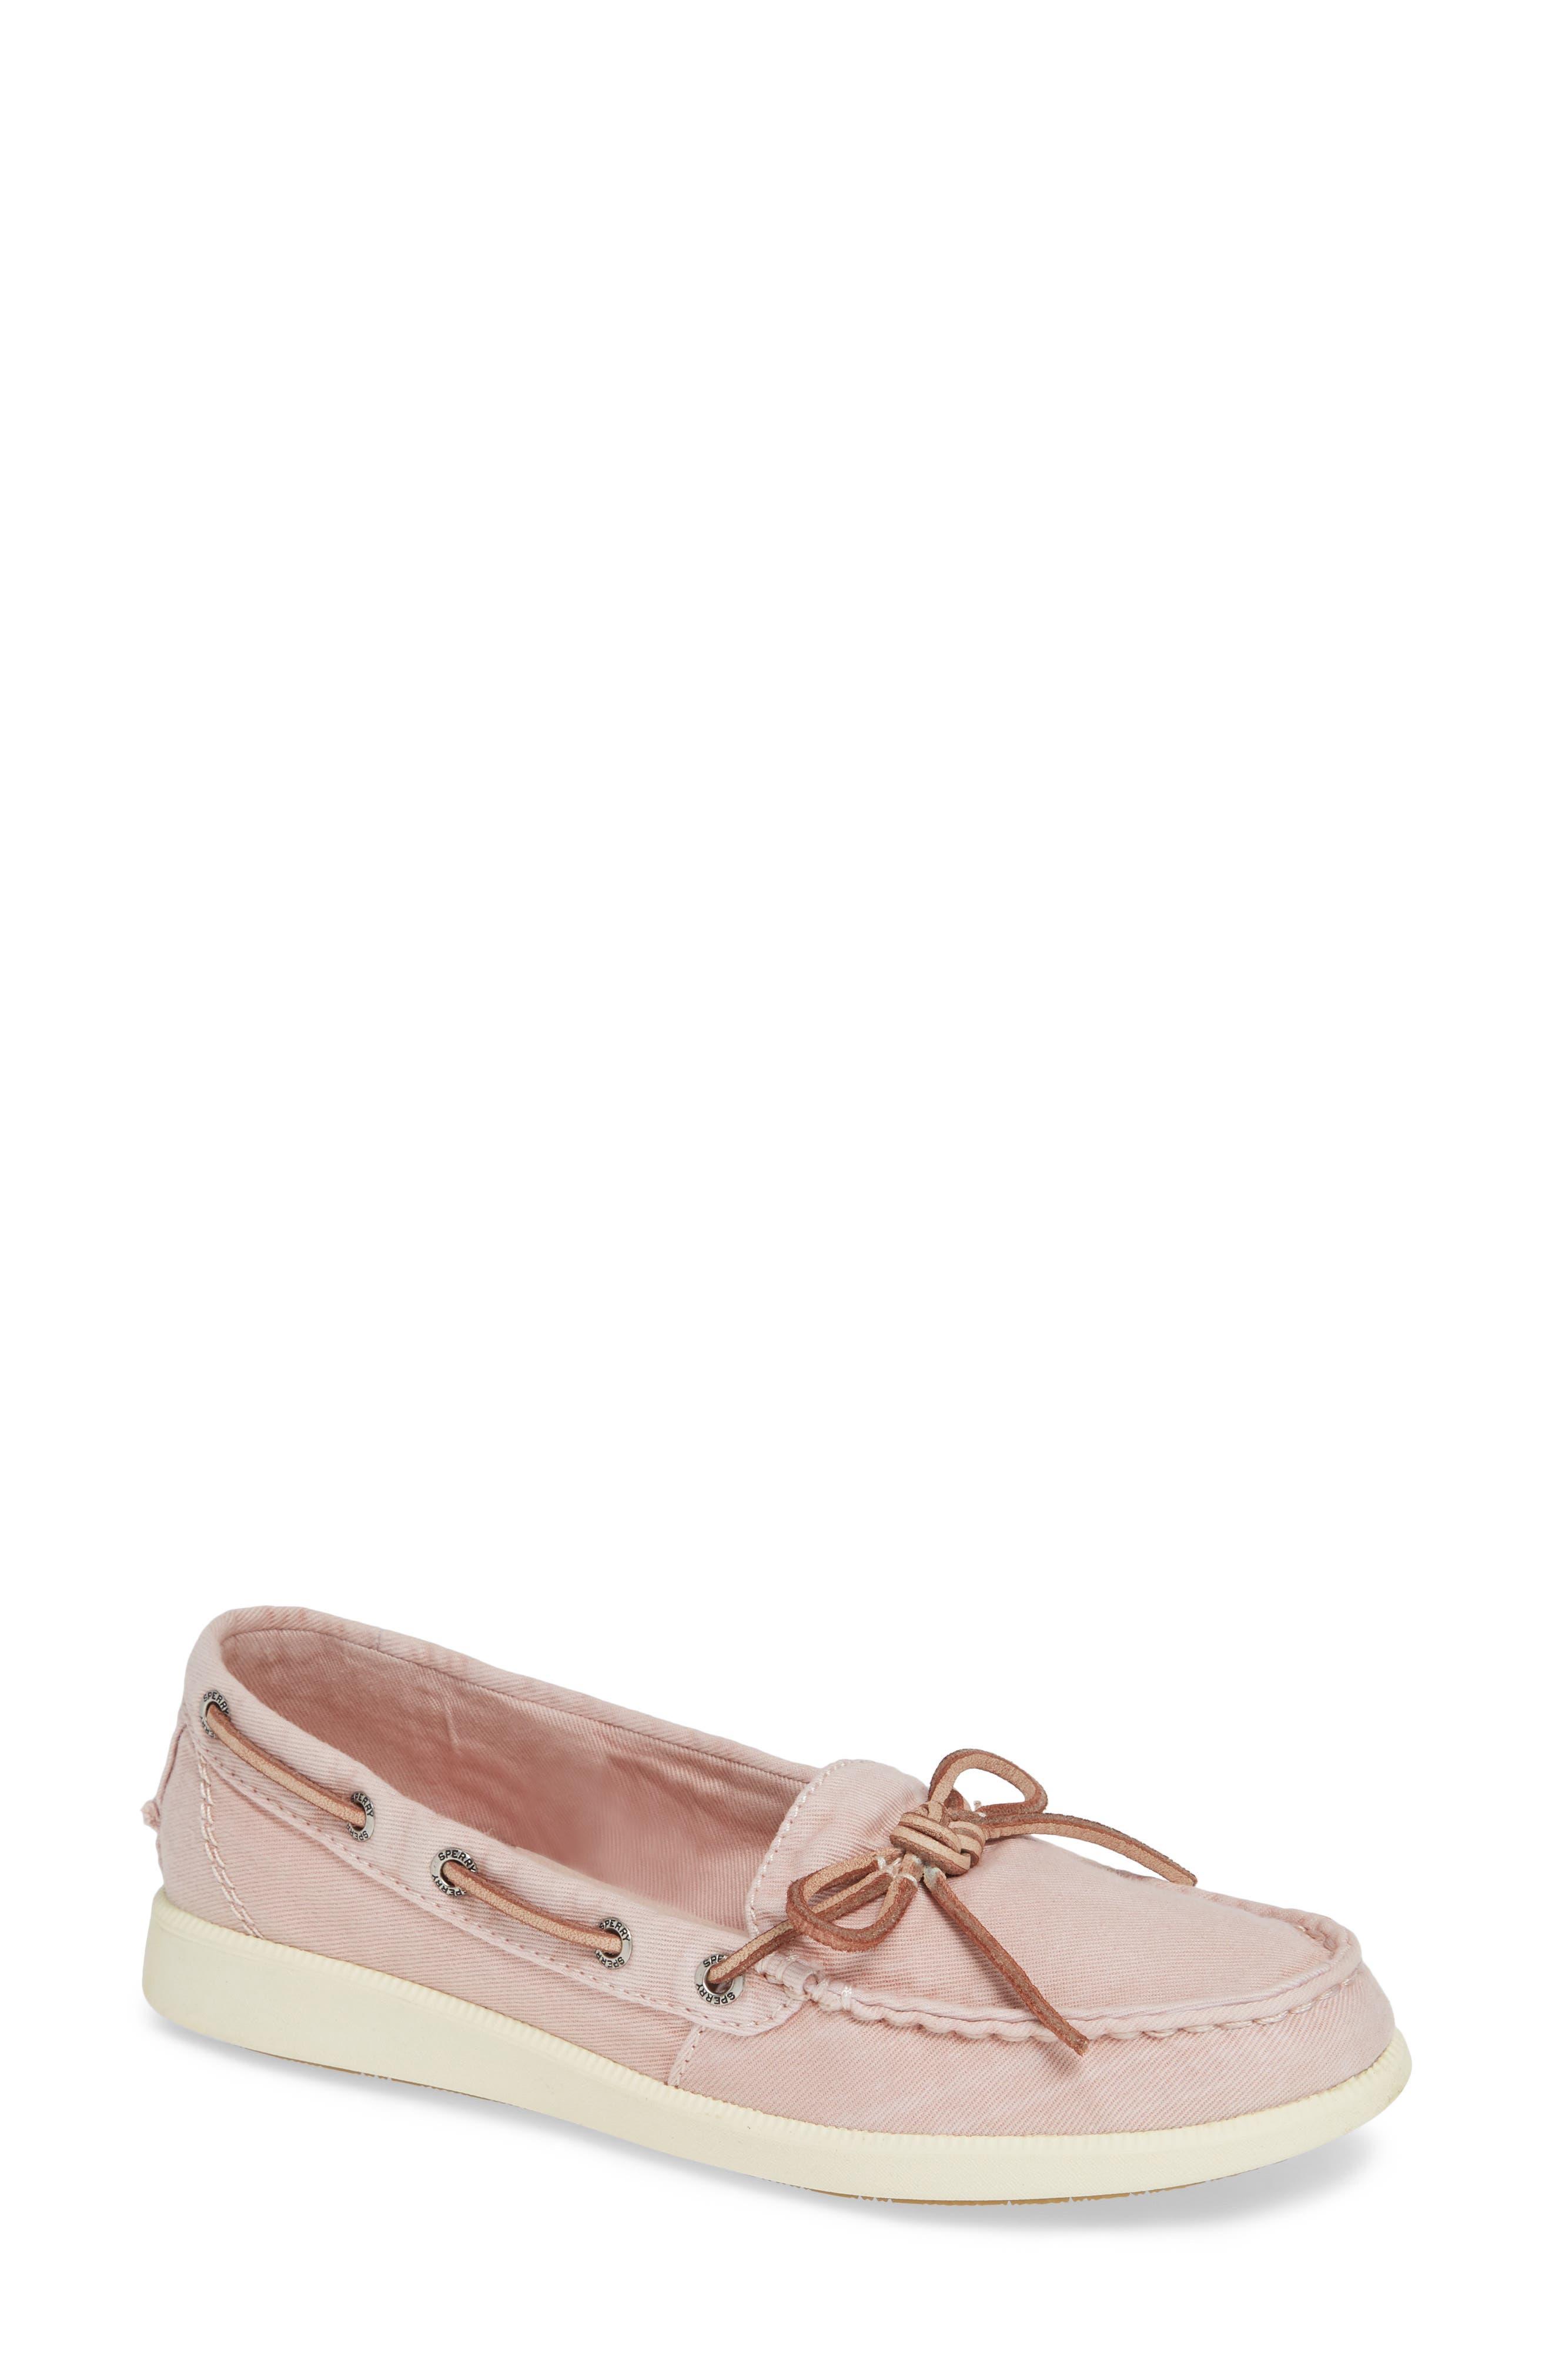 Oasis Boat Shoe,                         Main,                         color, ROSE CANVAS